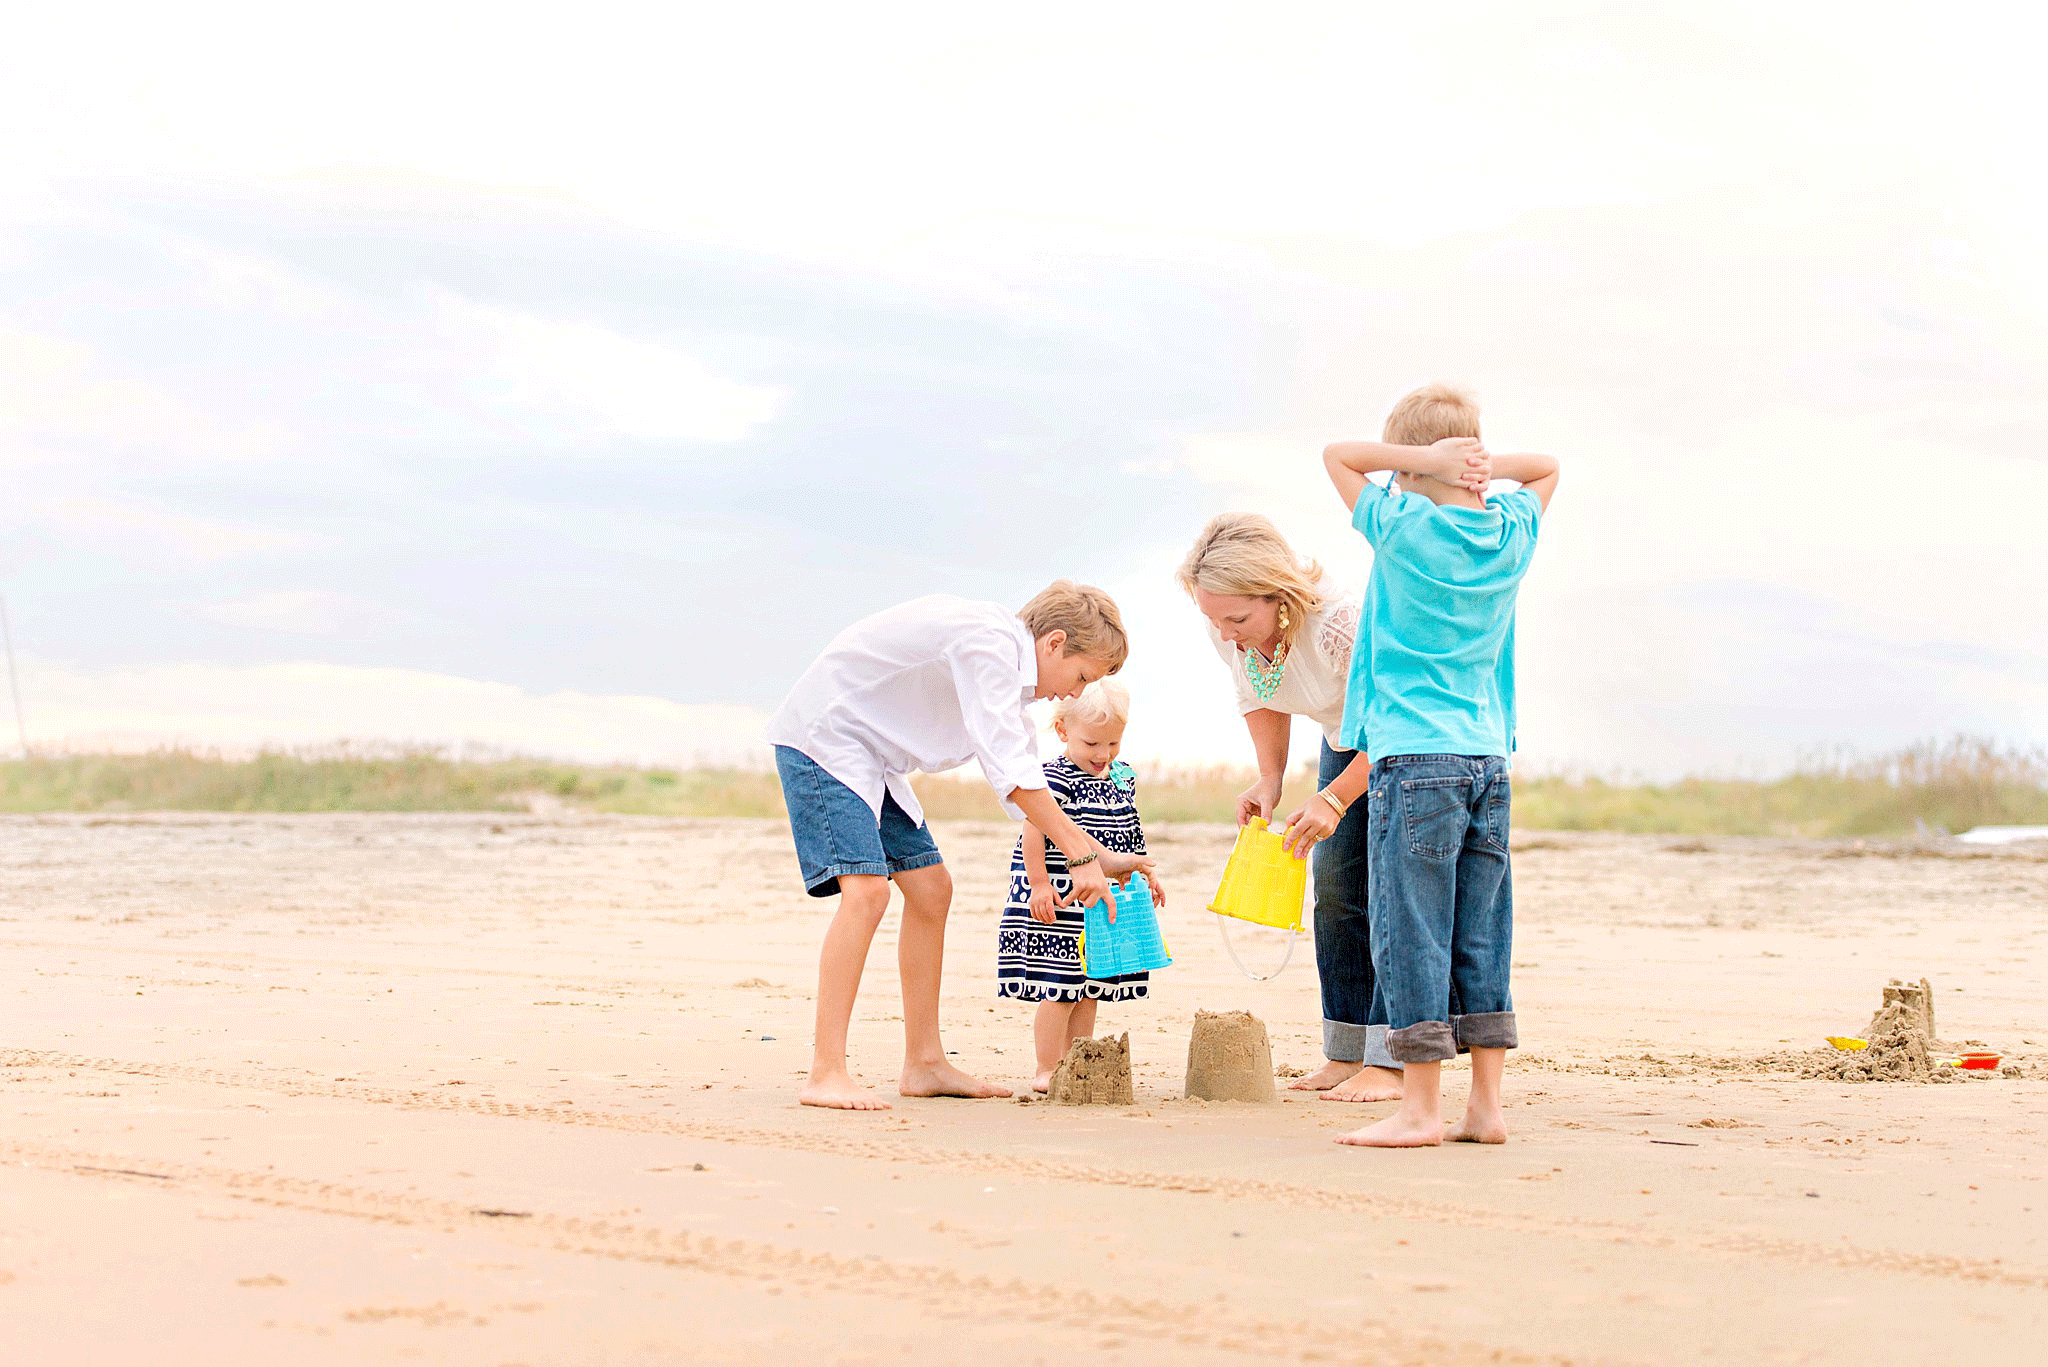 sandbridge-beach-family-photos-melissa-bliss-photography-virginia-beach-photographers-norfolk-portsmouth-chesapeake-photography.png